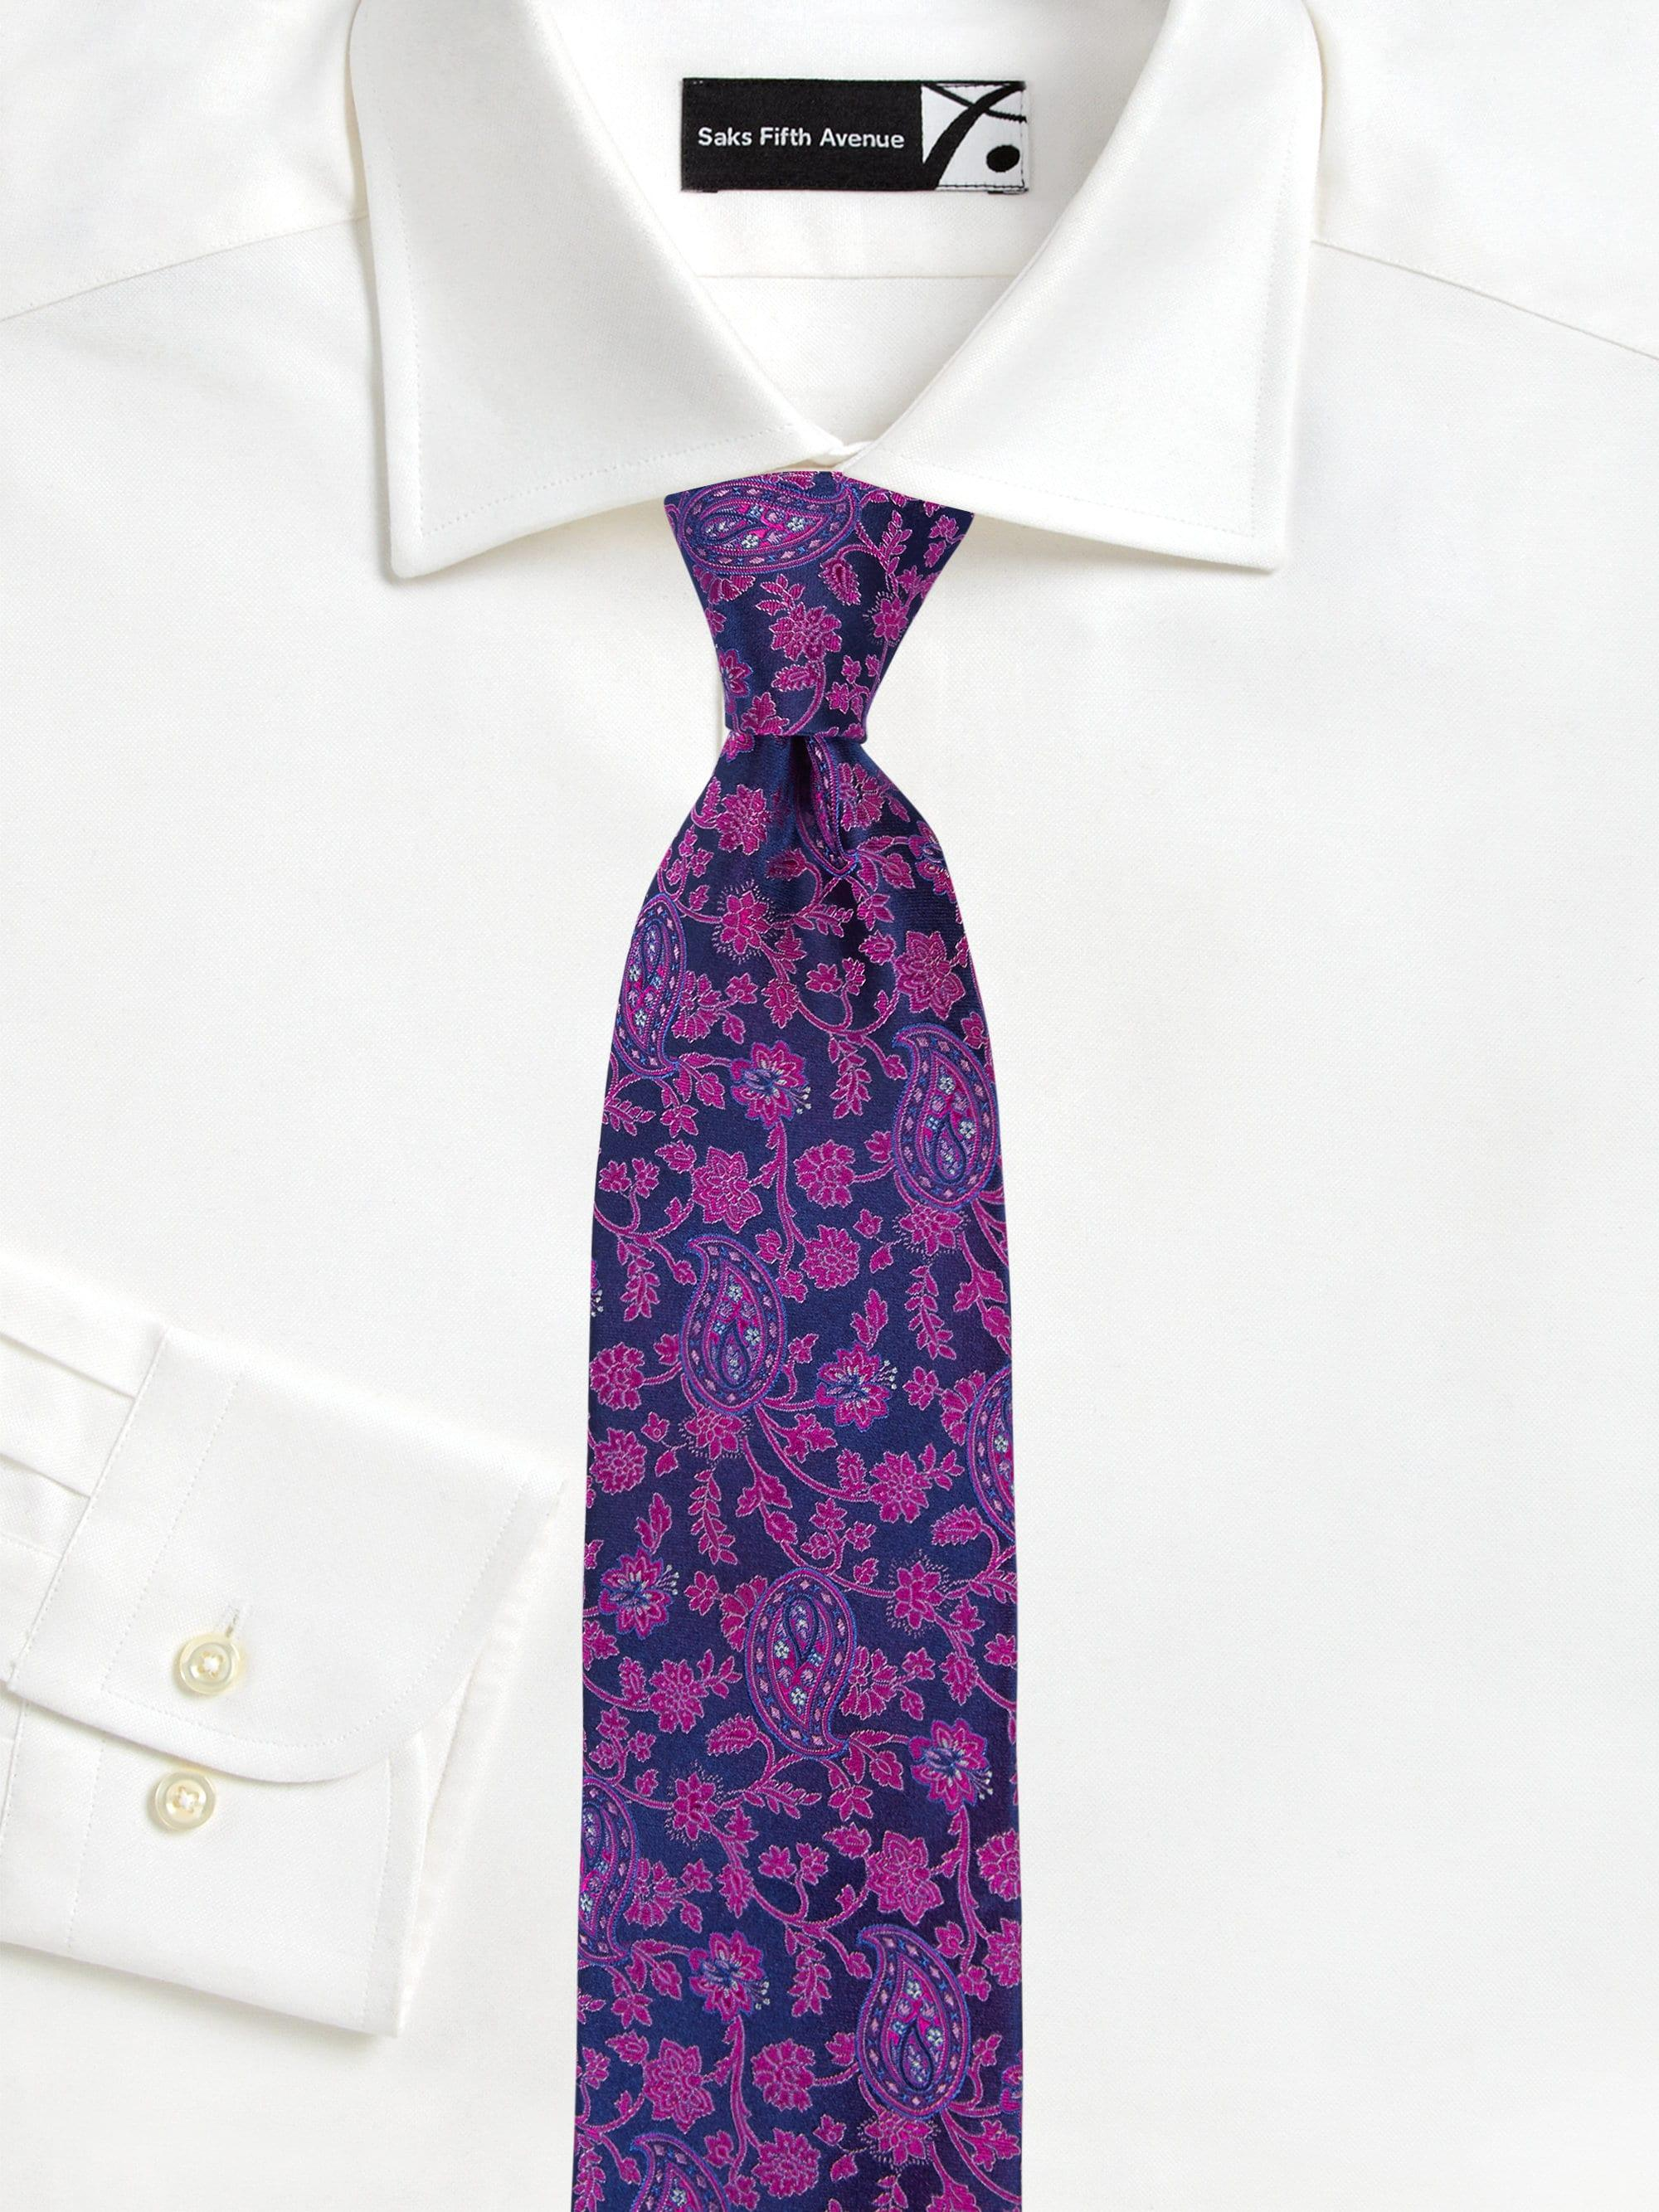 b23770114f77 Canali Men's Floral Paisley Silk Tie - Purple in Purple for Men - Lyst